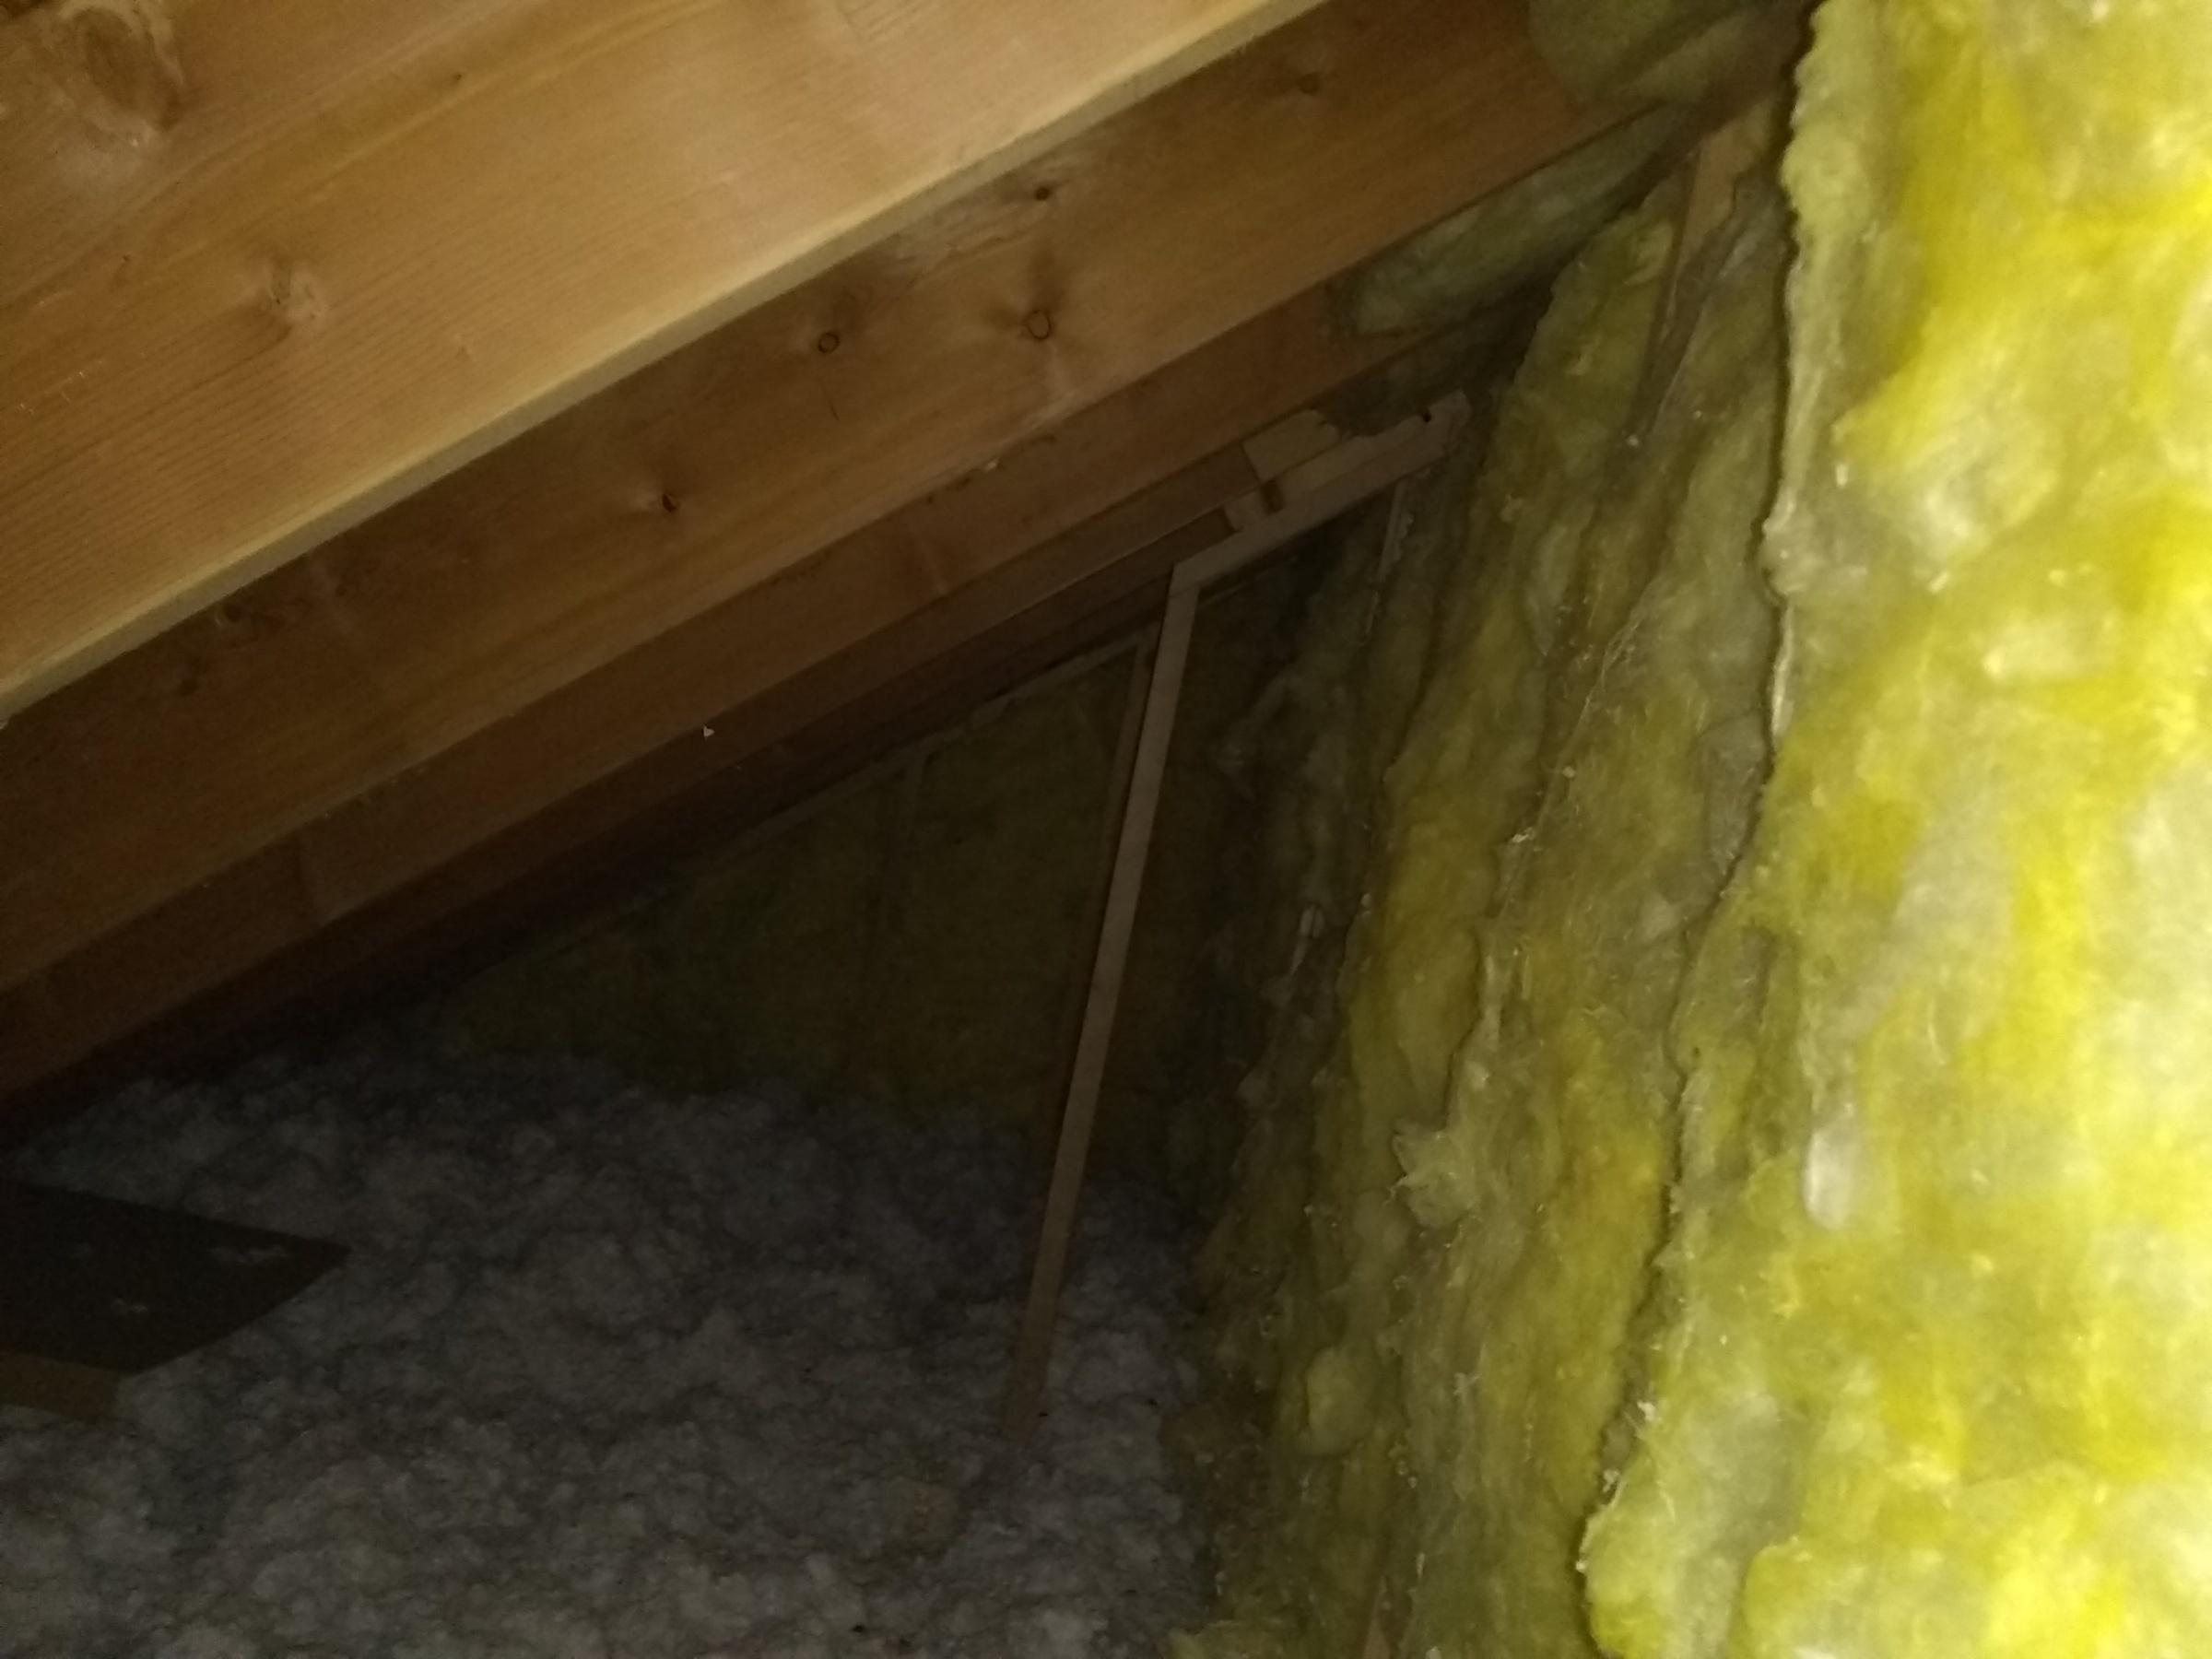 Plan for attic insulation-img_20181109_160530.jpg